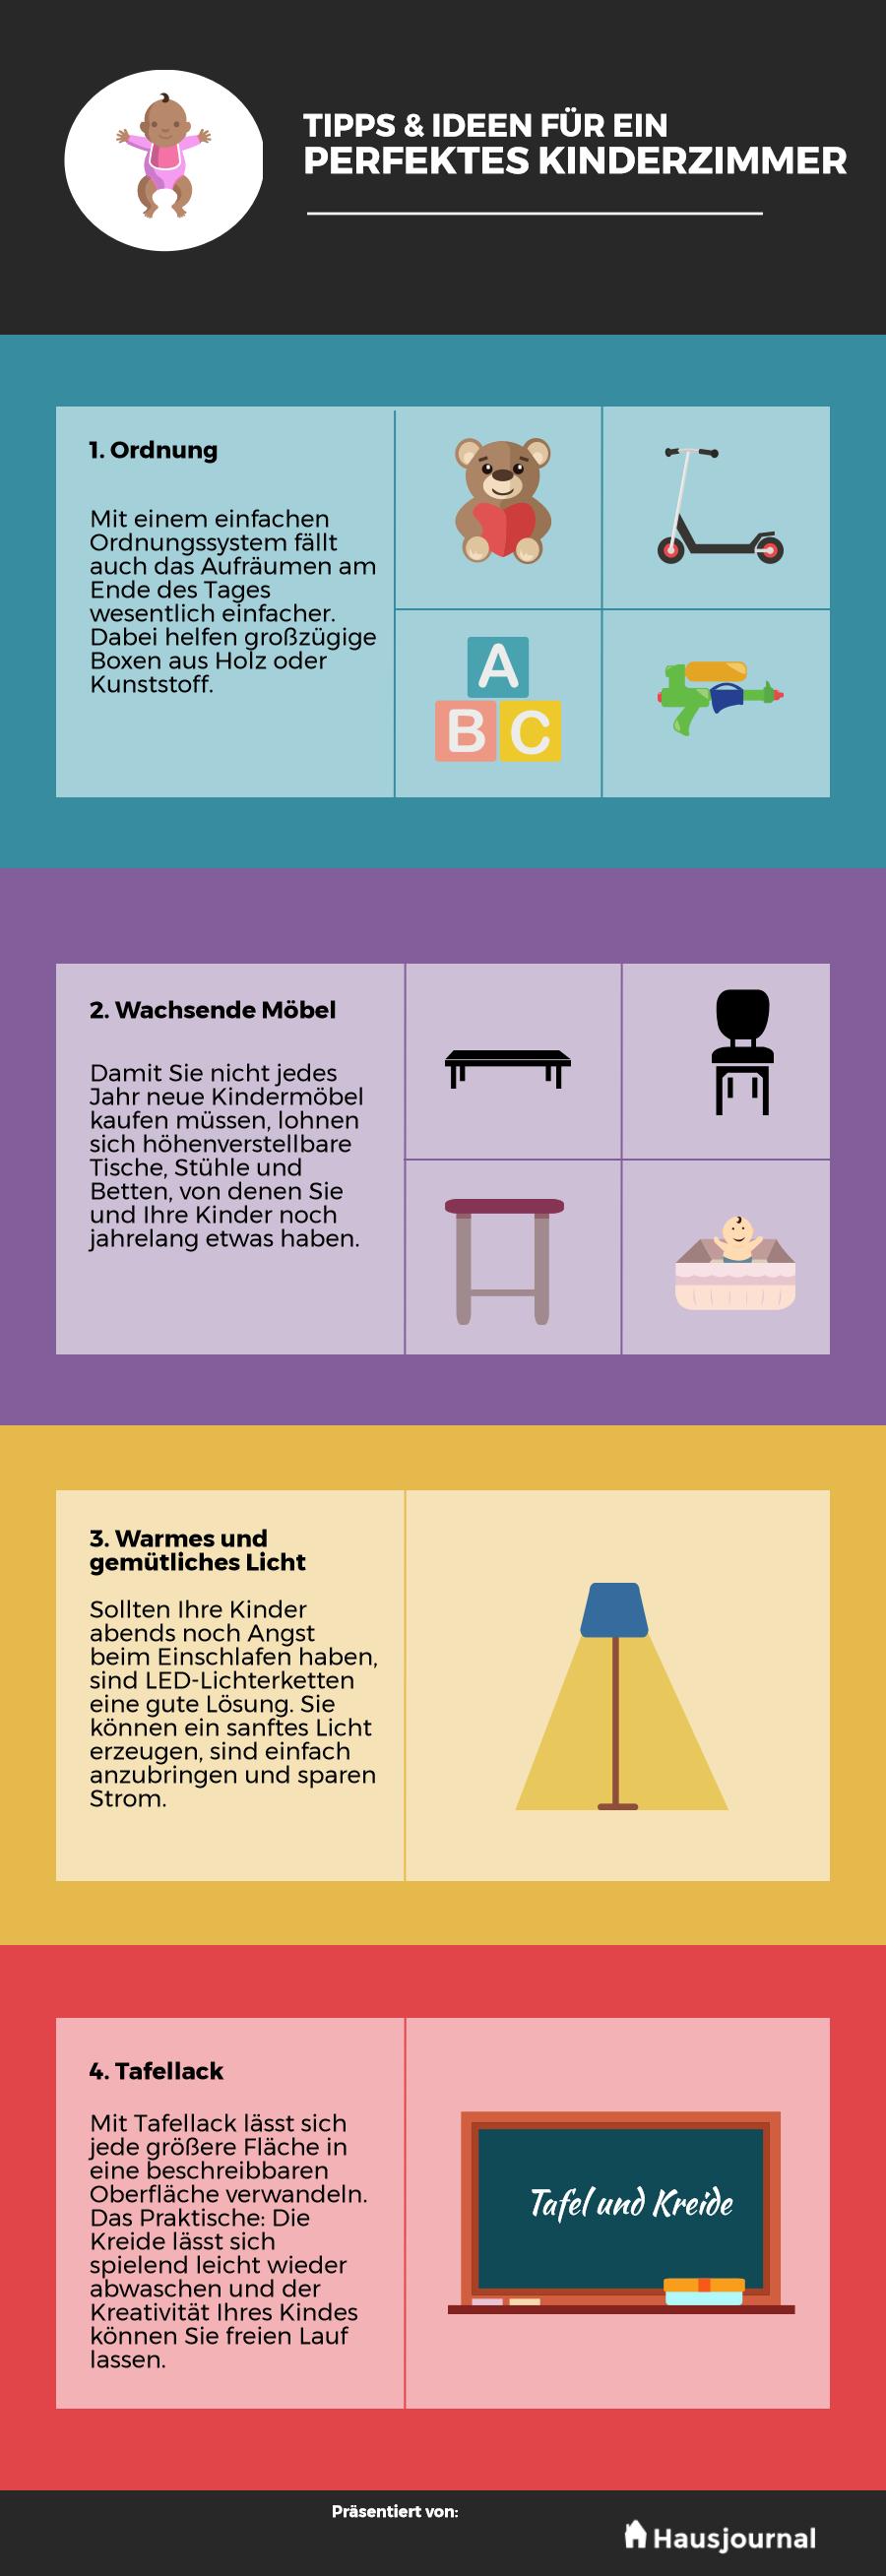 Infografik Ein perfektes Kinderzimmer